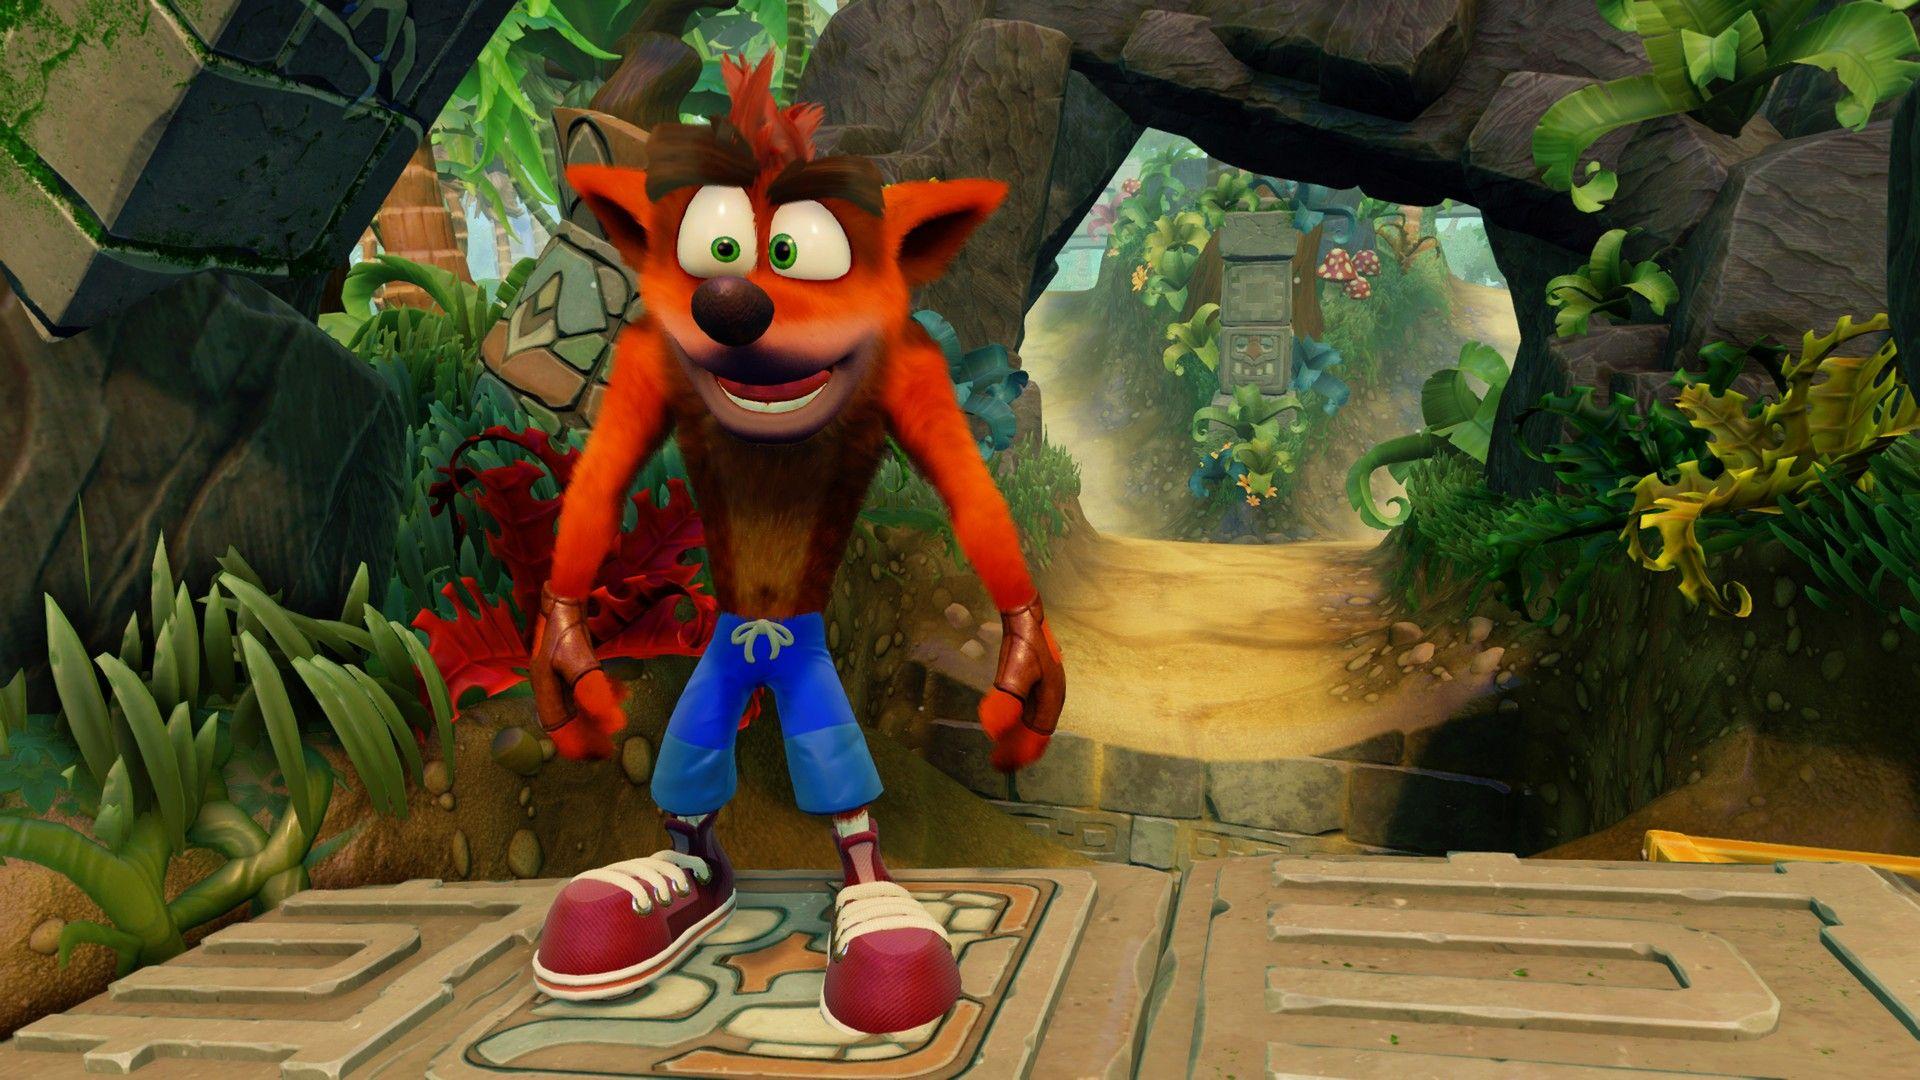 Crash Bandicoot N Sane Trilogy Crash Bandicoot Smash Bros Gamers